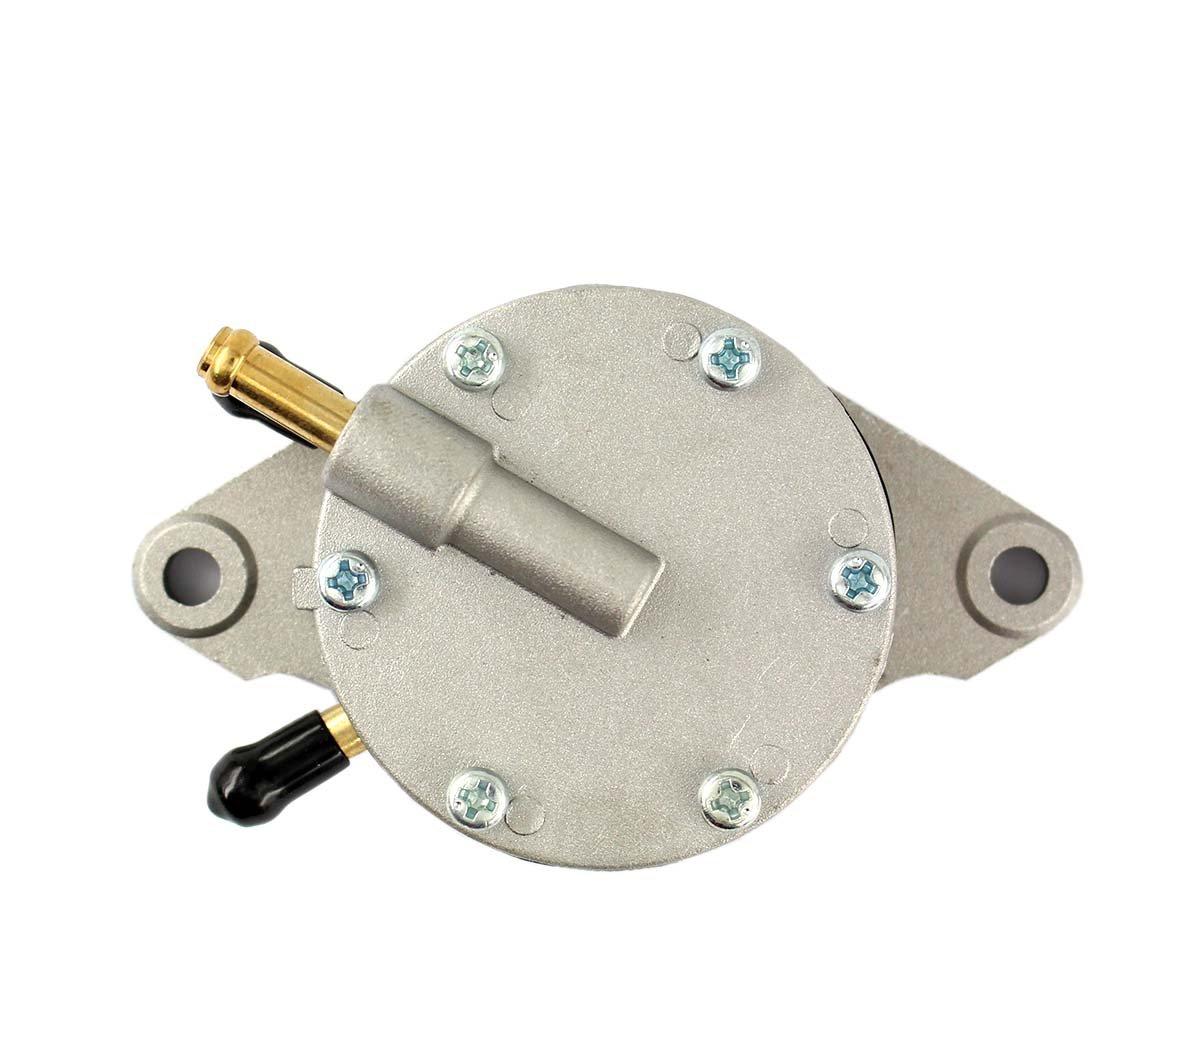 XtremeAmazing Fuel Pump for Yamaha Gas Golf Cart G2 G9 G11 G14 Model J38-24452-10-00